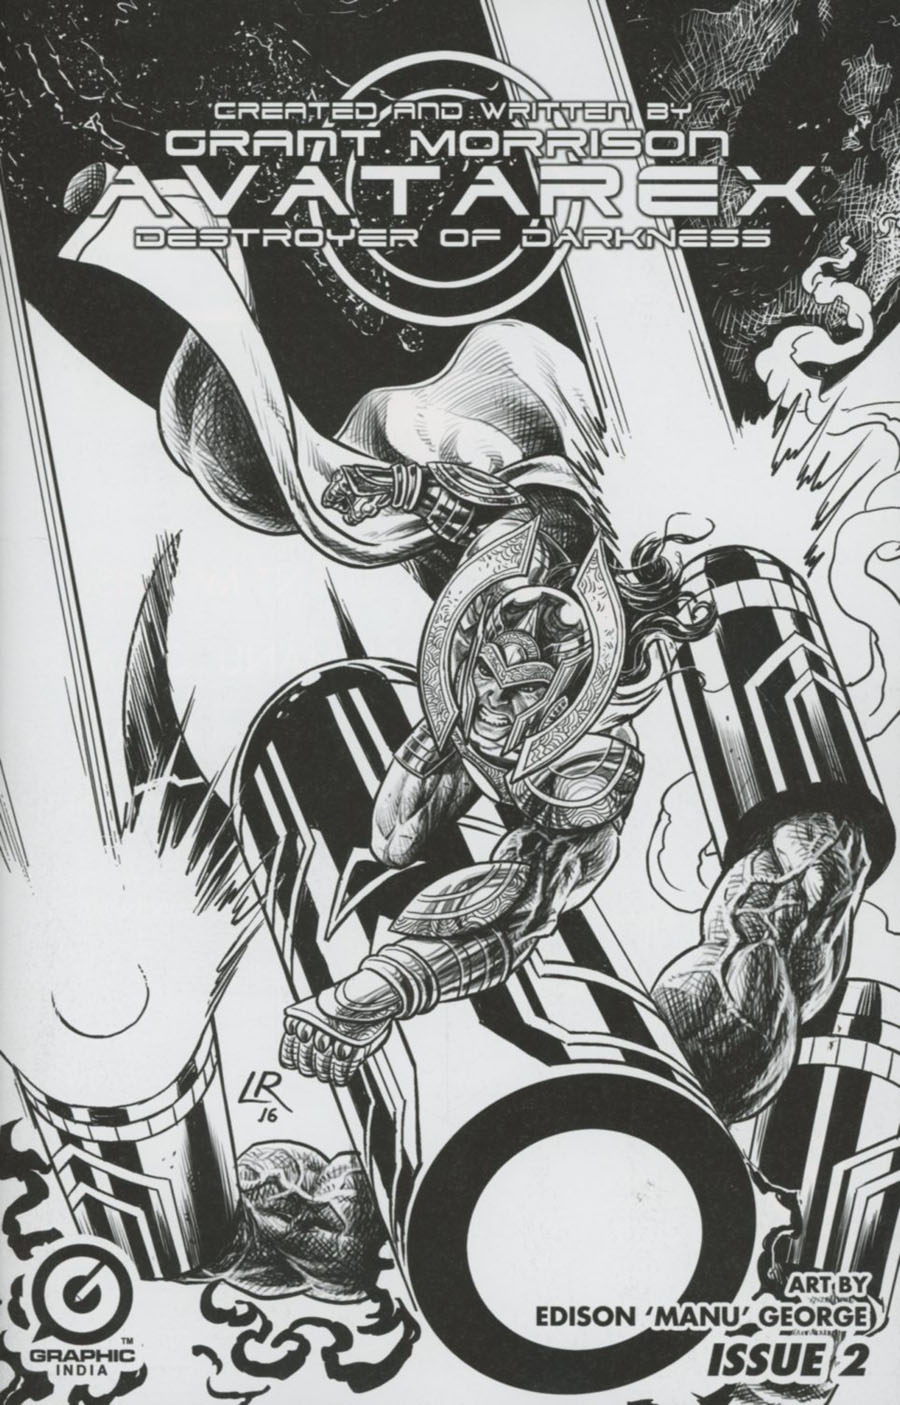 Grant Morrisons Avatarex Destroyer Of Darkness #2 Cover D Variant Luke Ross Rare Pencil Sketch Cover